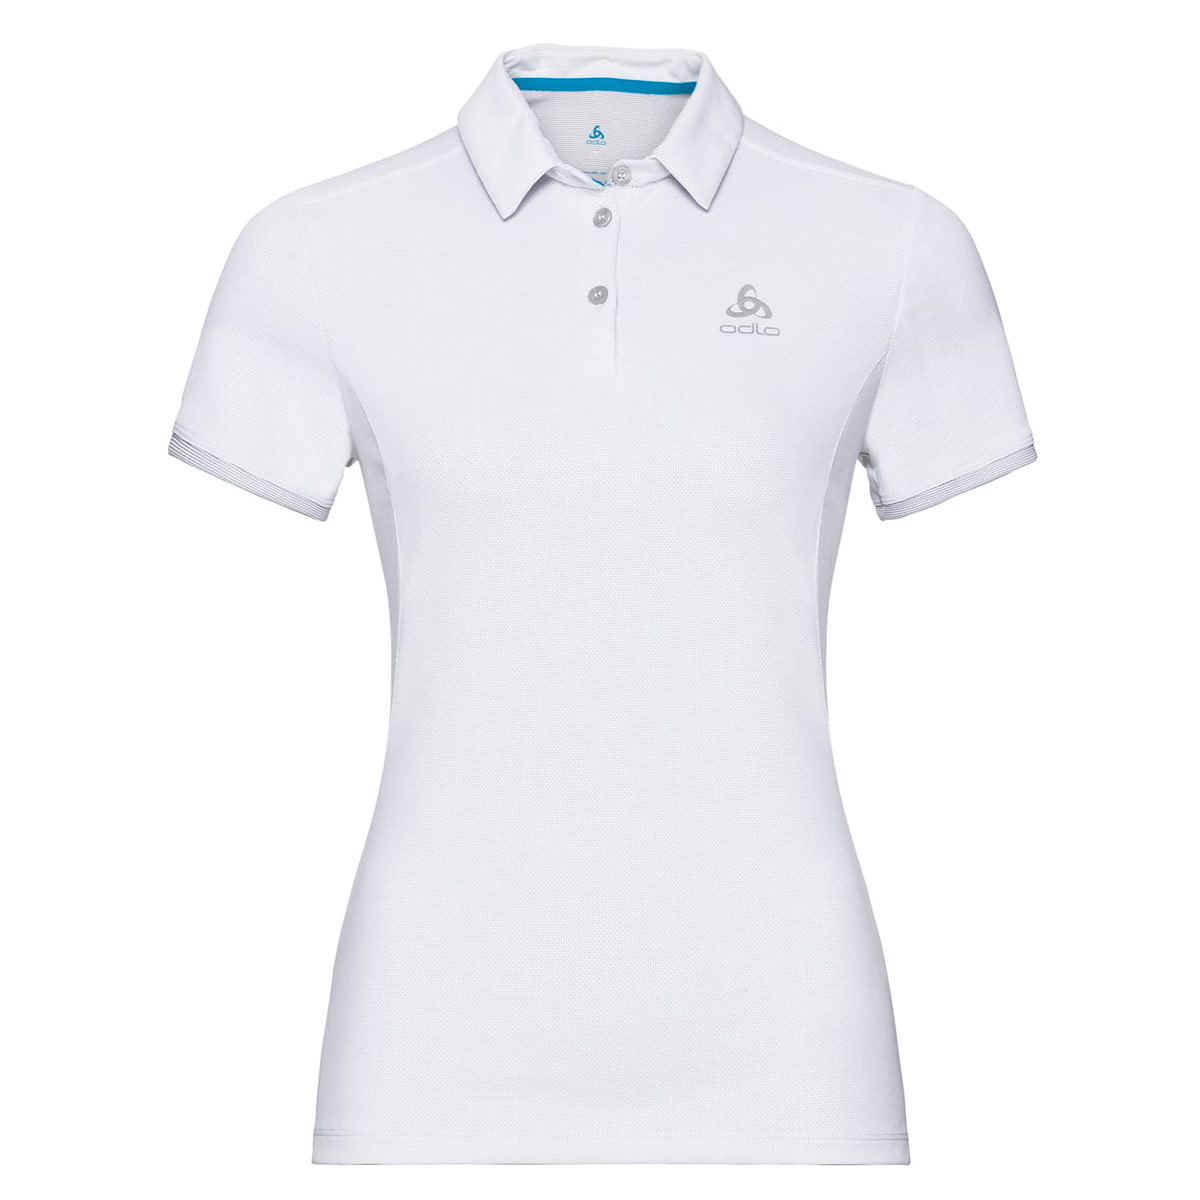 688ed8a15724f6 Odlo Polo Short Sleeve Kumano F-Dry Light - Freizeitbekleidung für Damen -  Weiß